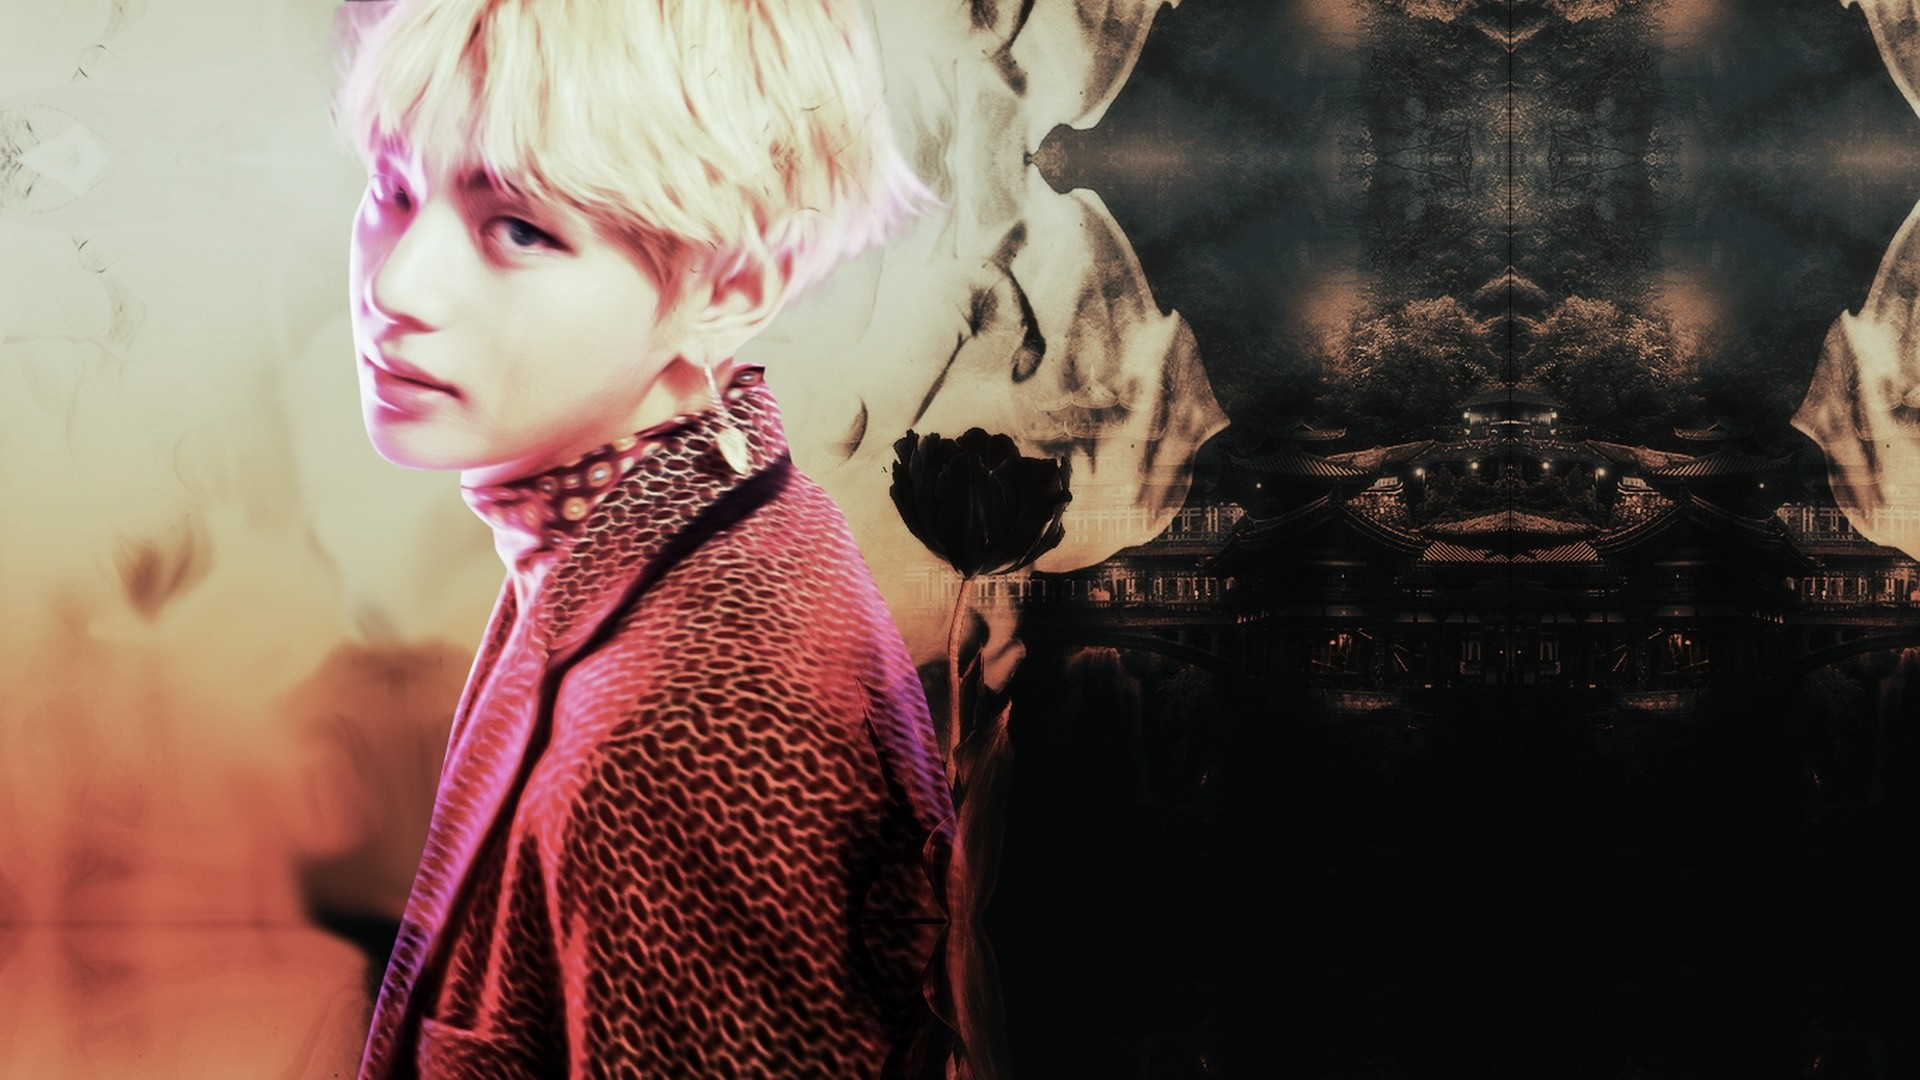 Taehyung Wallpaper image hd